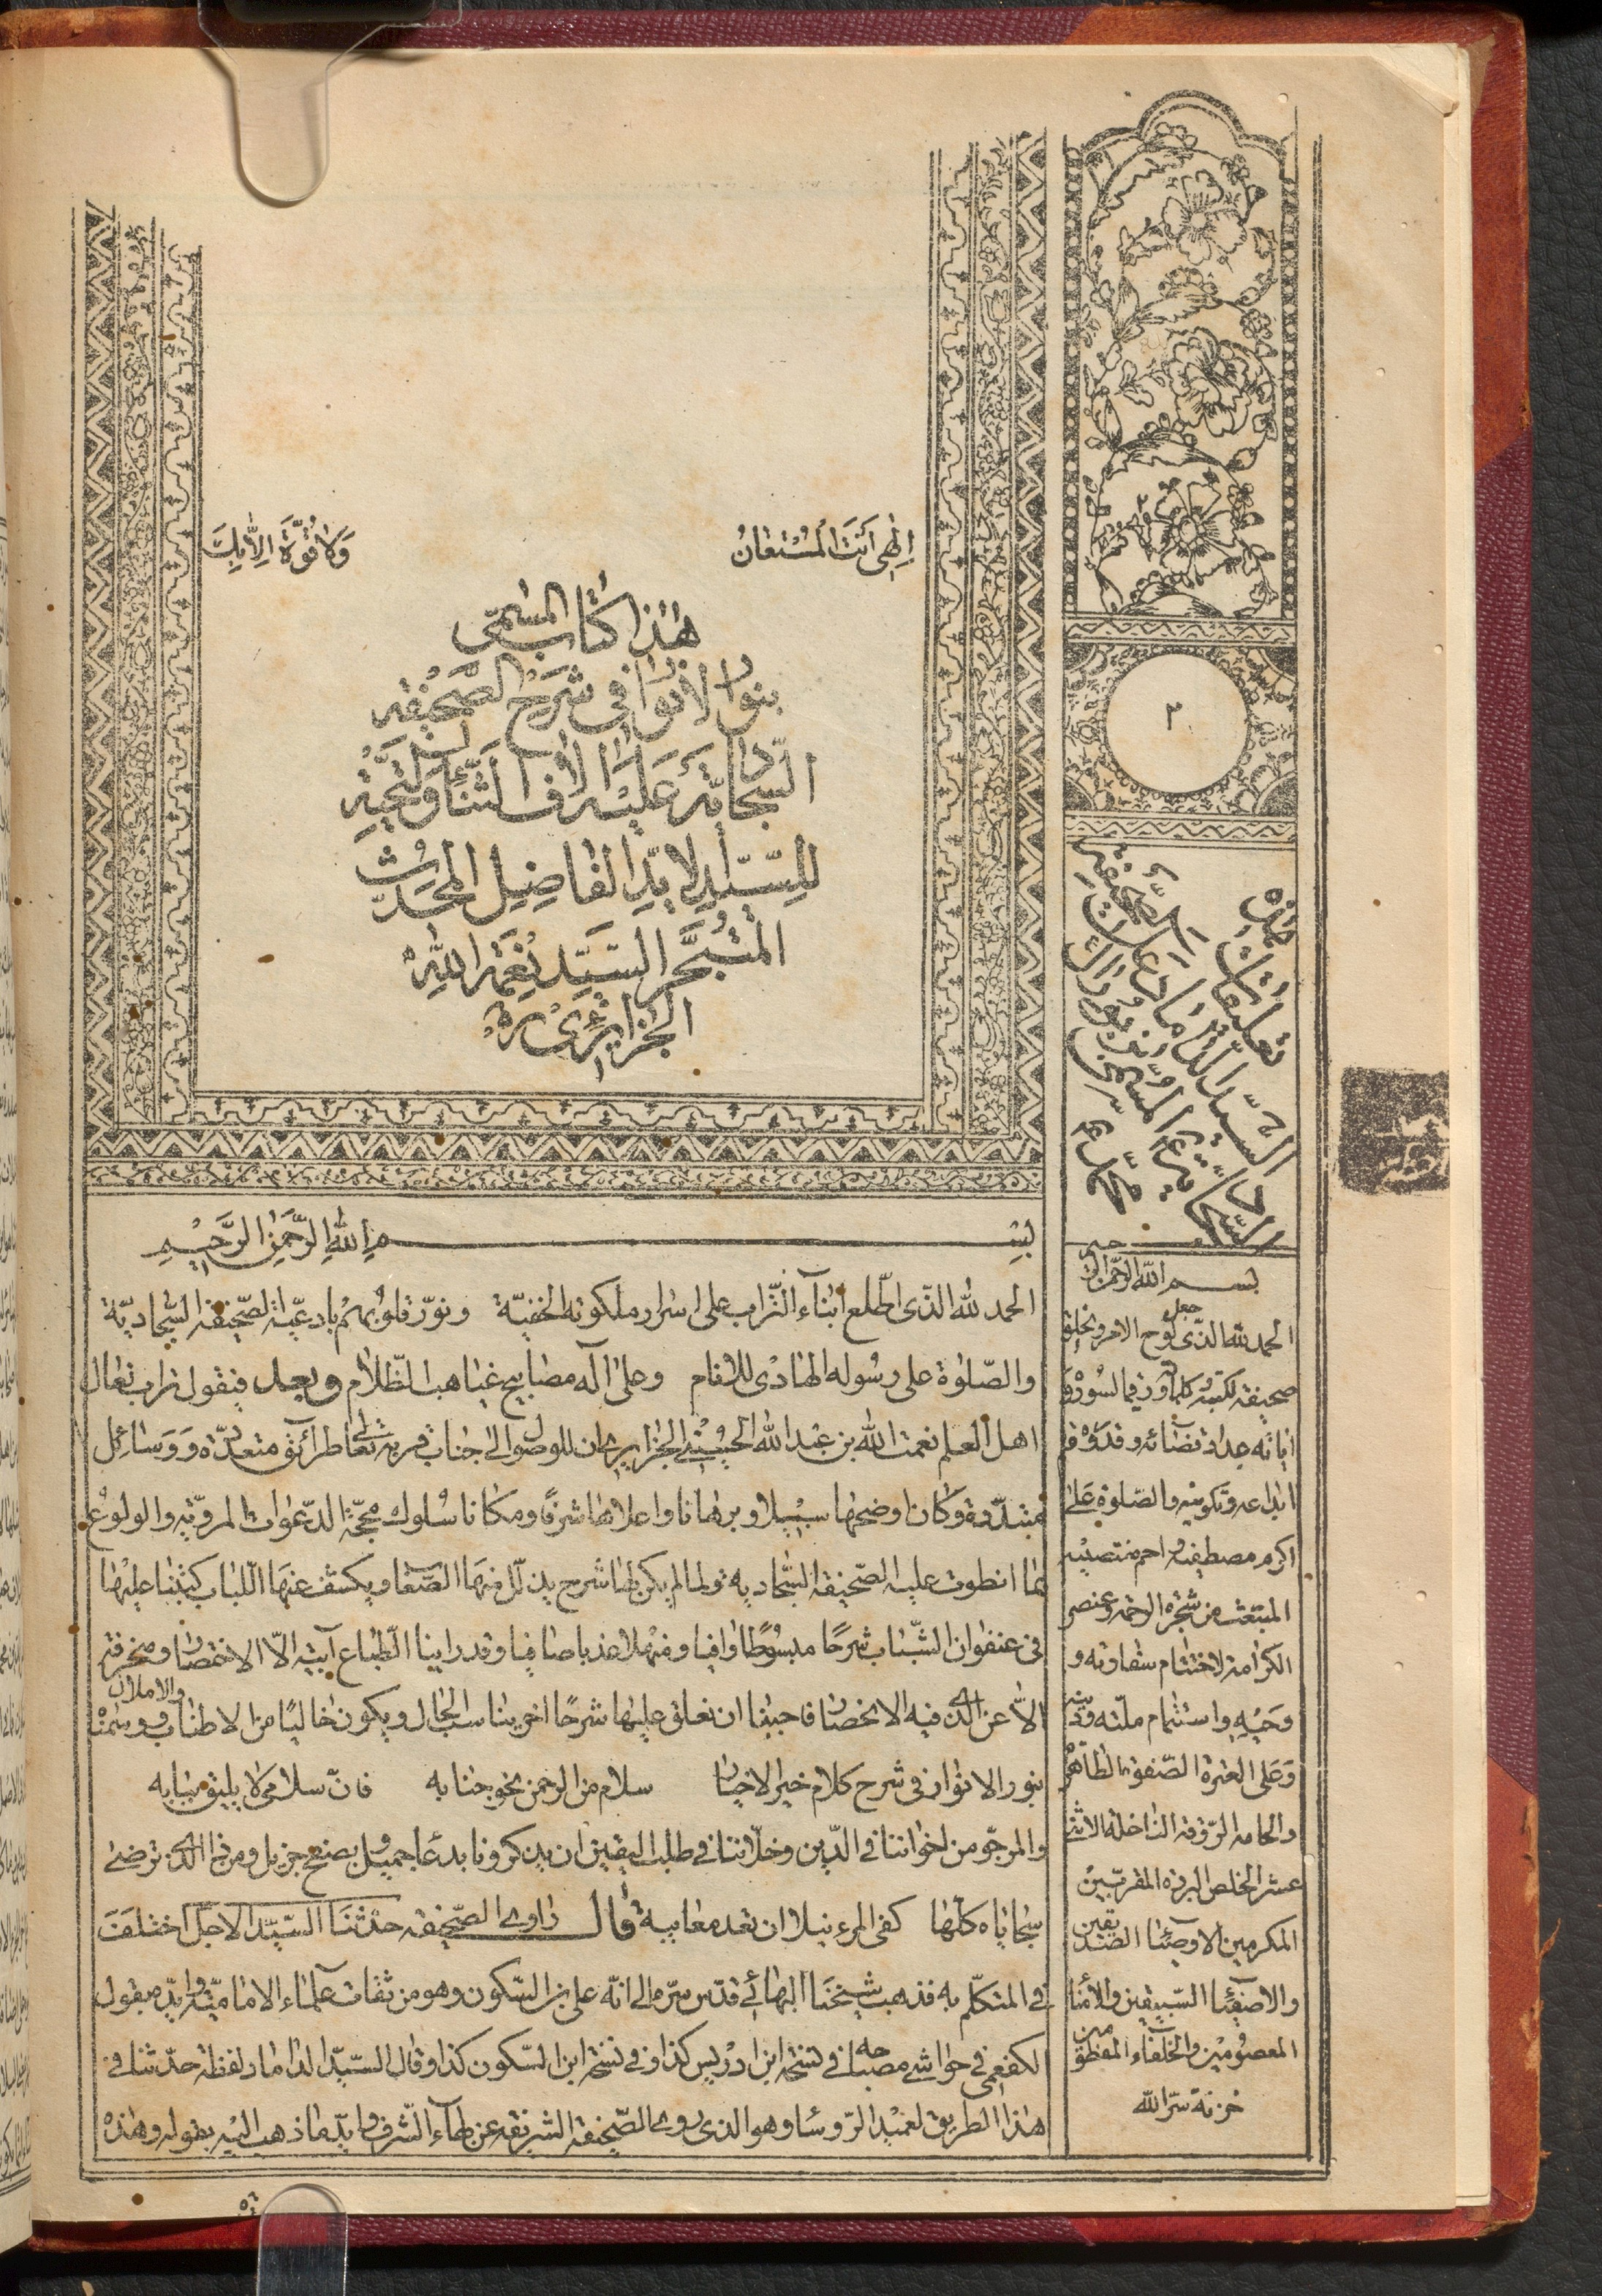 Jazāʾirī, Niʻmat Allāh ibn ʻAbd Allāh, 1640 or 41-1701. Nūr al-anwār fī sharḥ al-Ṣaḥīfah al-Sajjādīyah. [Tehran : s.n.], 1316-1317 [1898 or 1899].